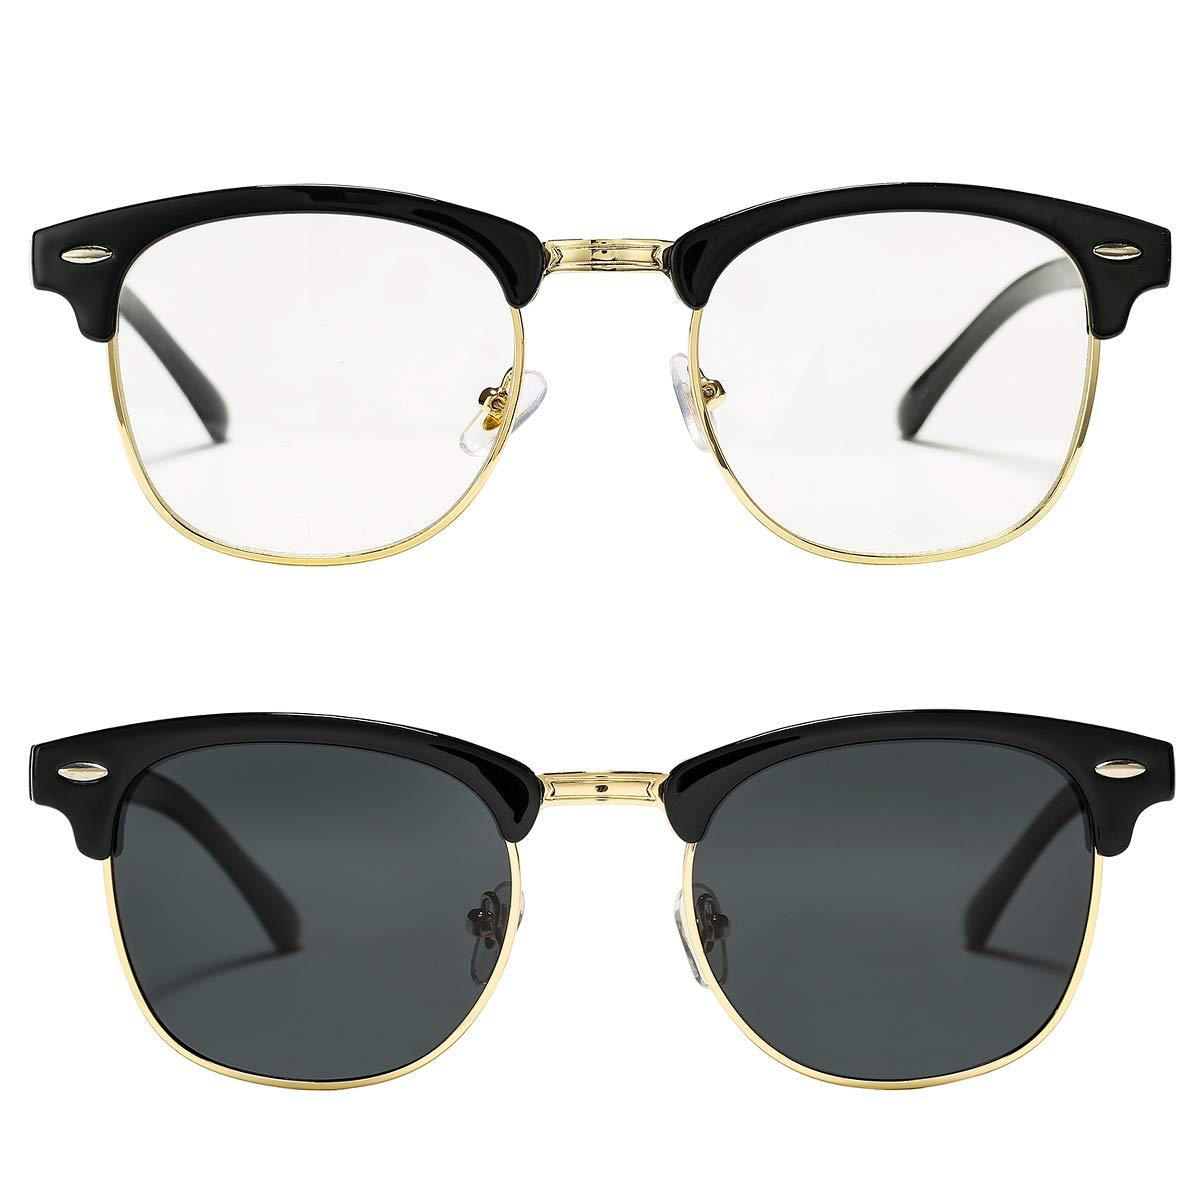 Pro Acme Semi Rimless Polarized Sunglasses for Men Women Classic Brand Designer (Black + Clear) by Pro Acme